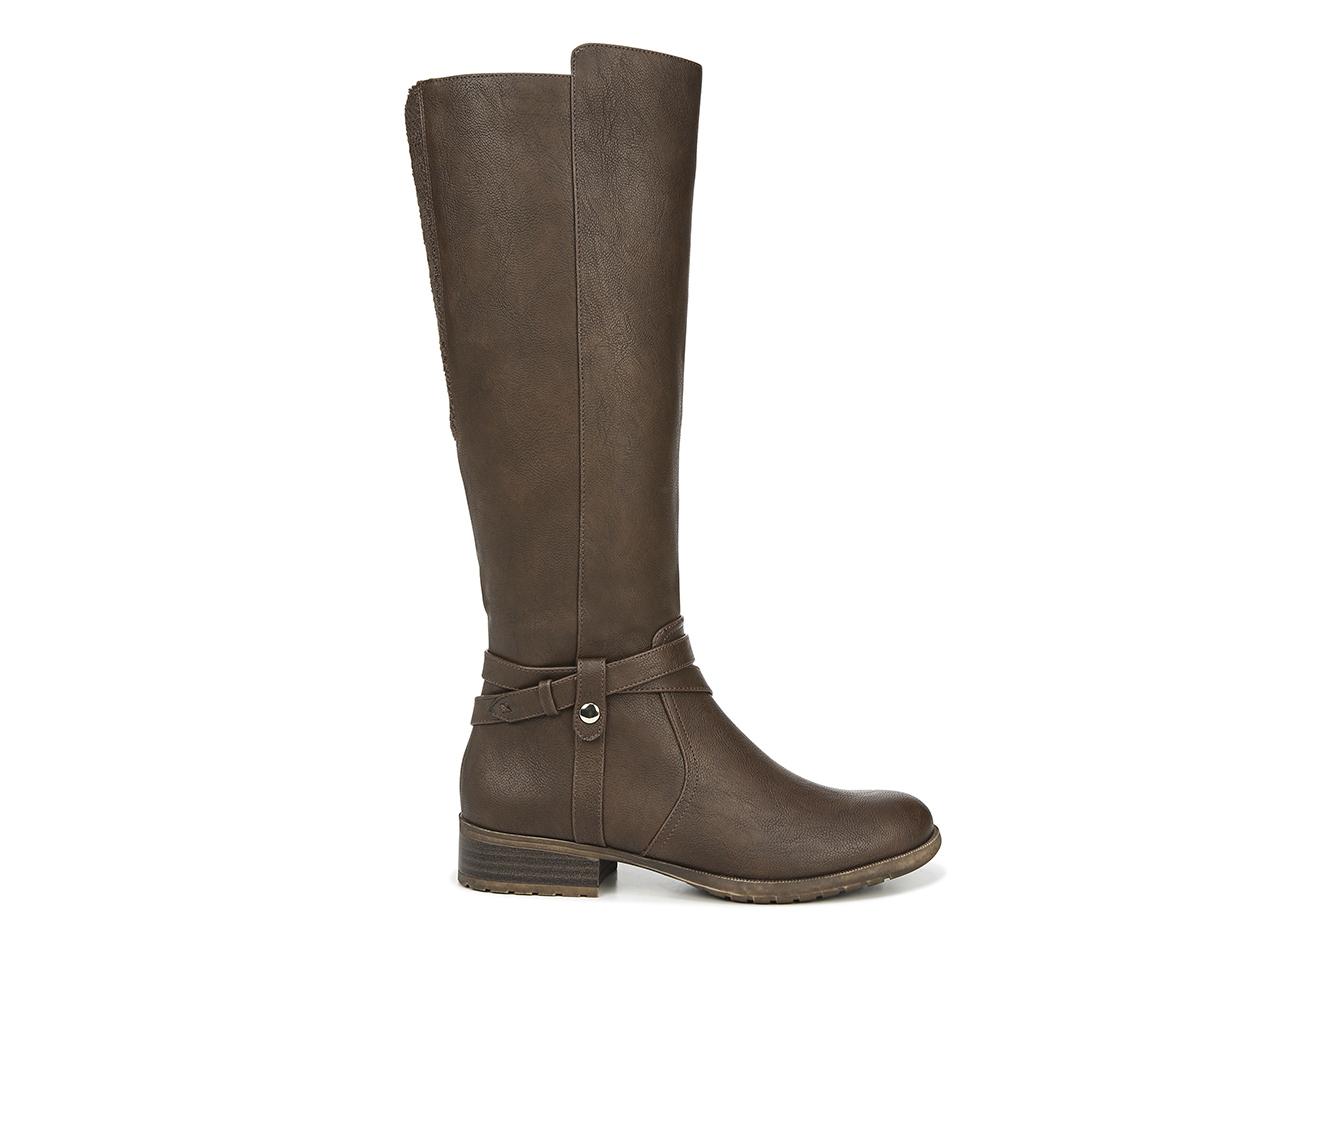 LifeStride Xtrovert Women's Boots (Brown - Faux Leather)